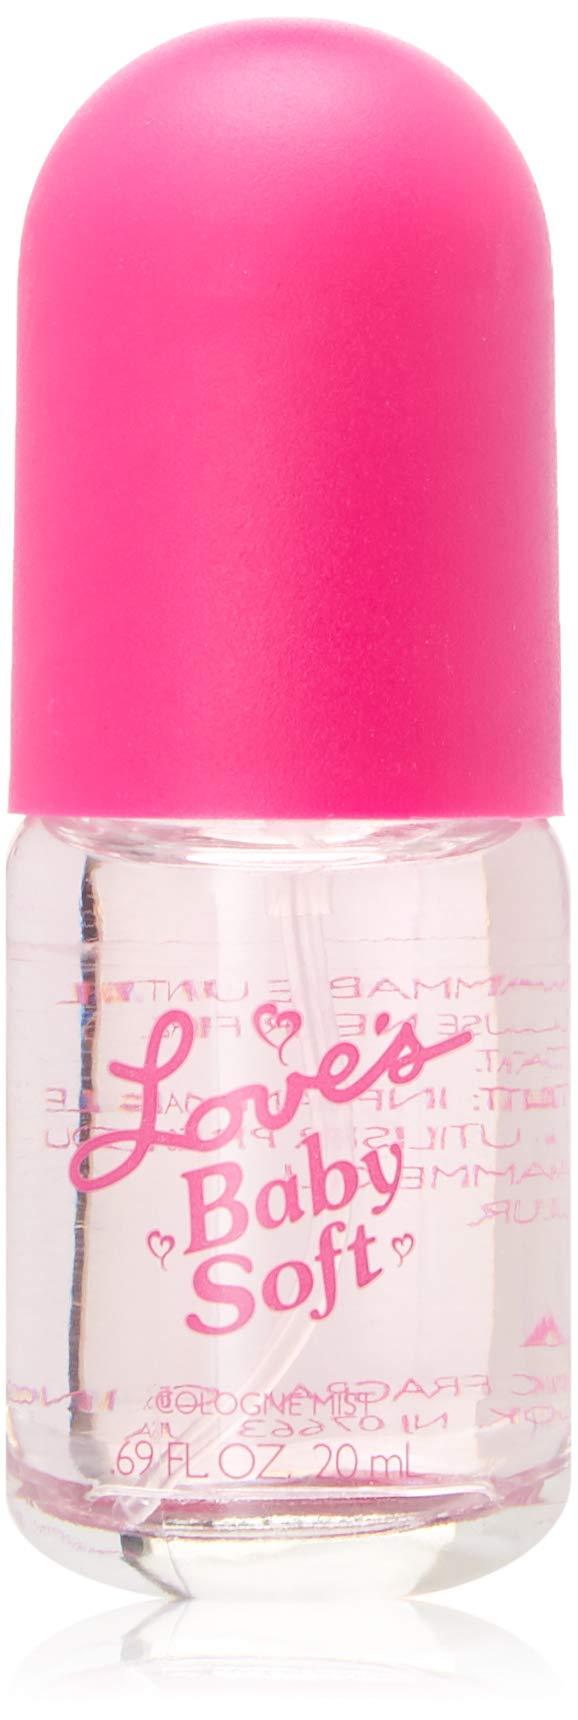 Dana Love's Baby Soft Gift Set with Teddy Bear & Perfume for Women by Dana